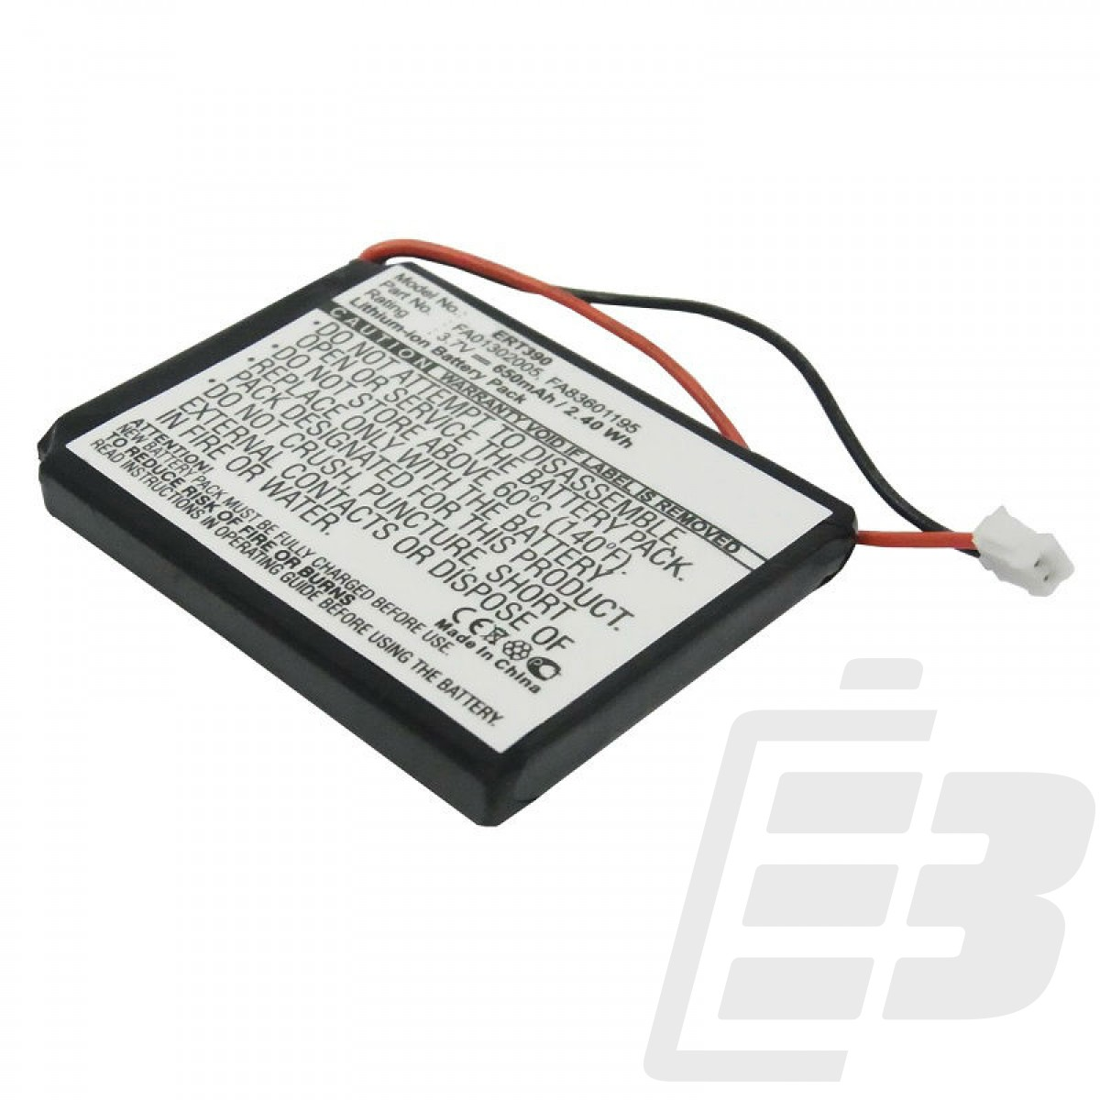 Cordless phone battery Avaya 3720_1